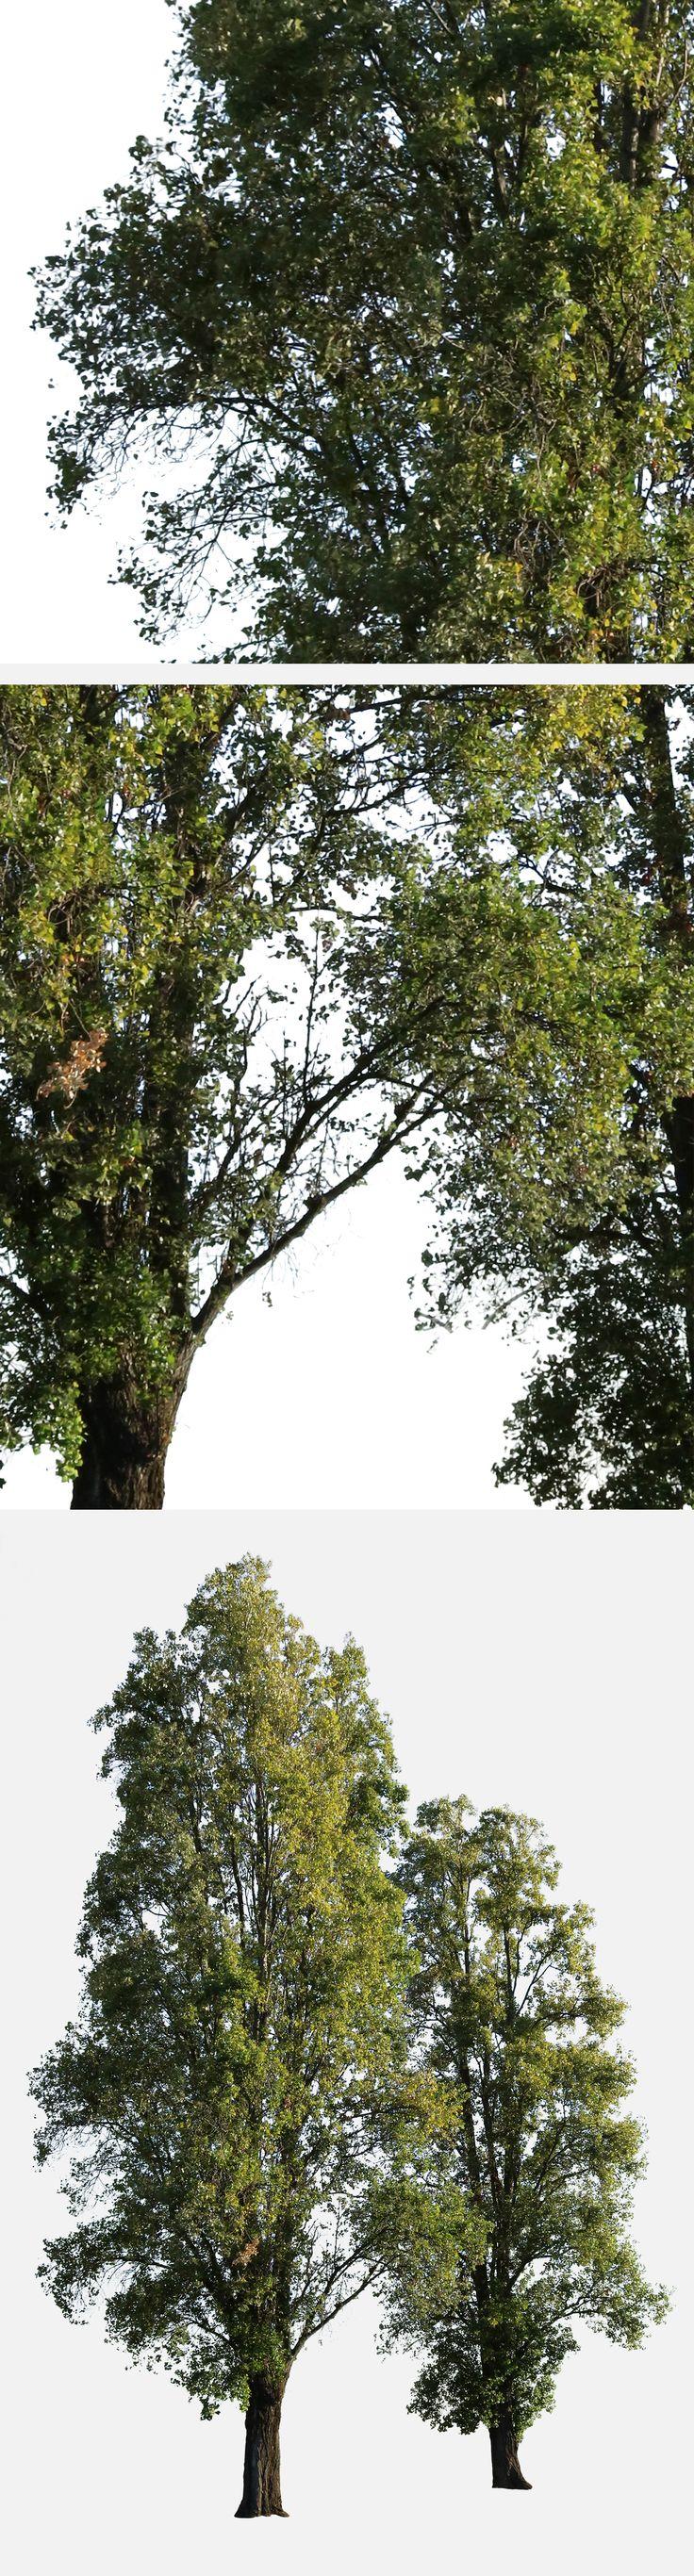 3472 x 4990 Pixels. PNG, with transparent background. Cutout photo of black poplar tree group. Populus nigra En: Black poplar; Fr: Peuplier; Pt: Choupo negro; Es: Álamo negro; It: Pioppo nero; De: Schwarz-Pappel.